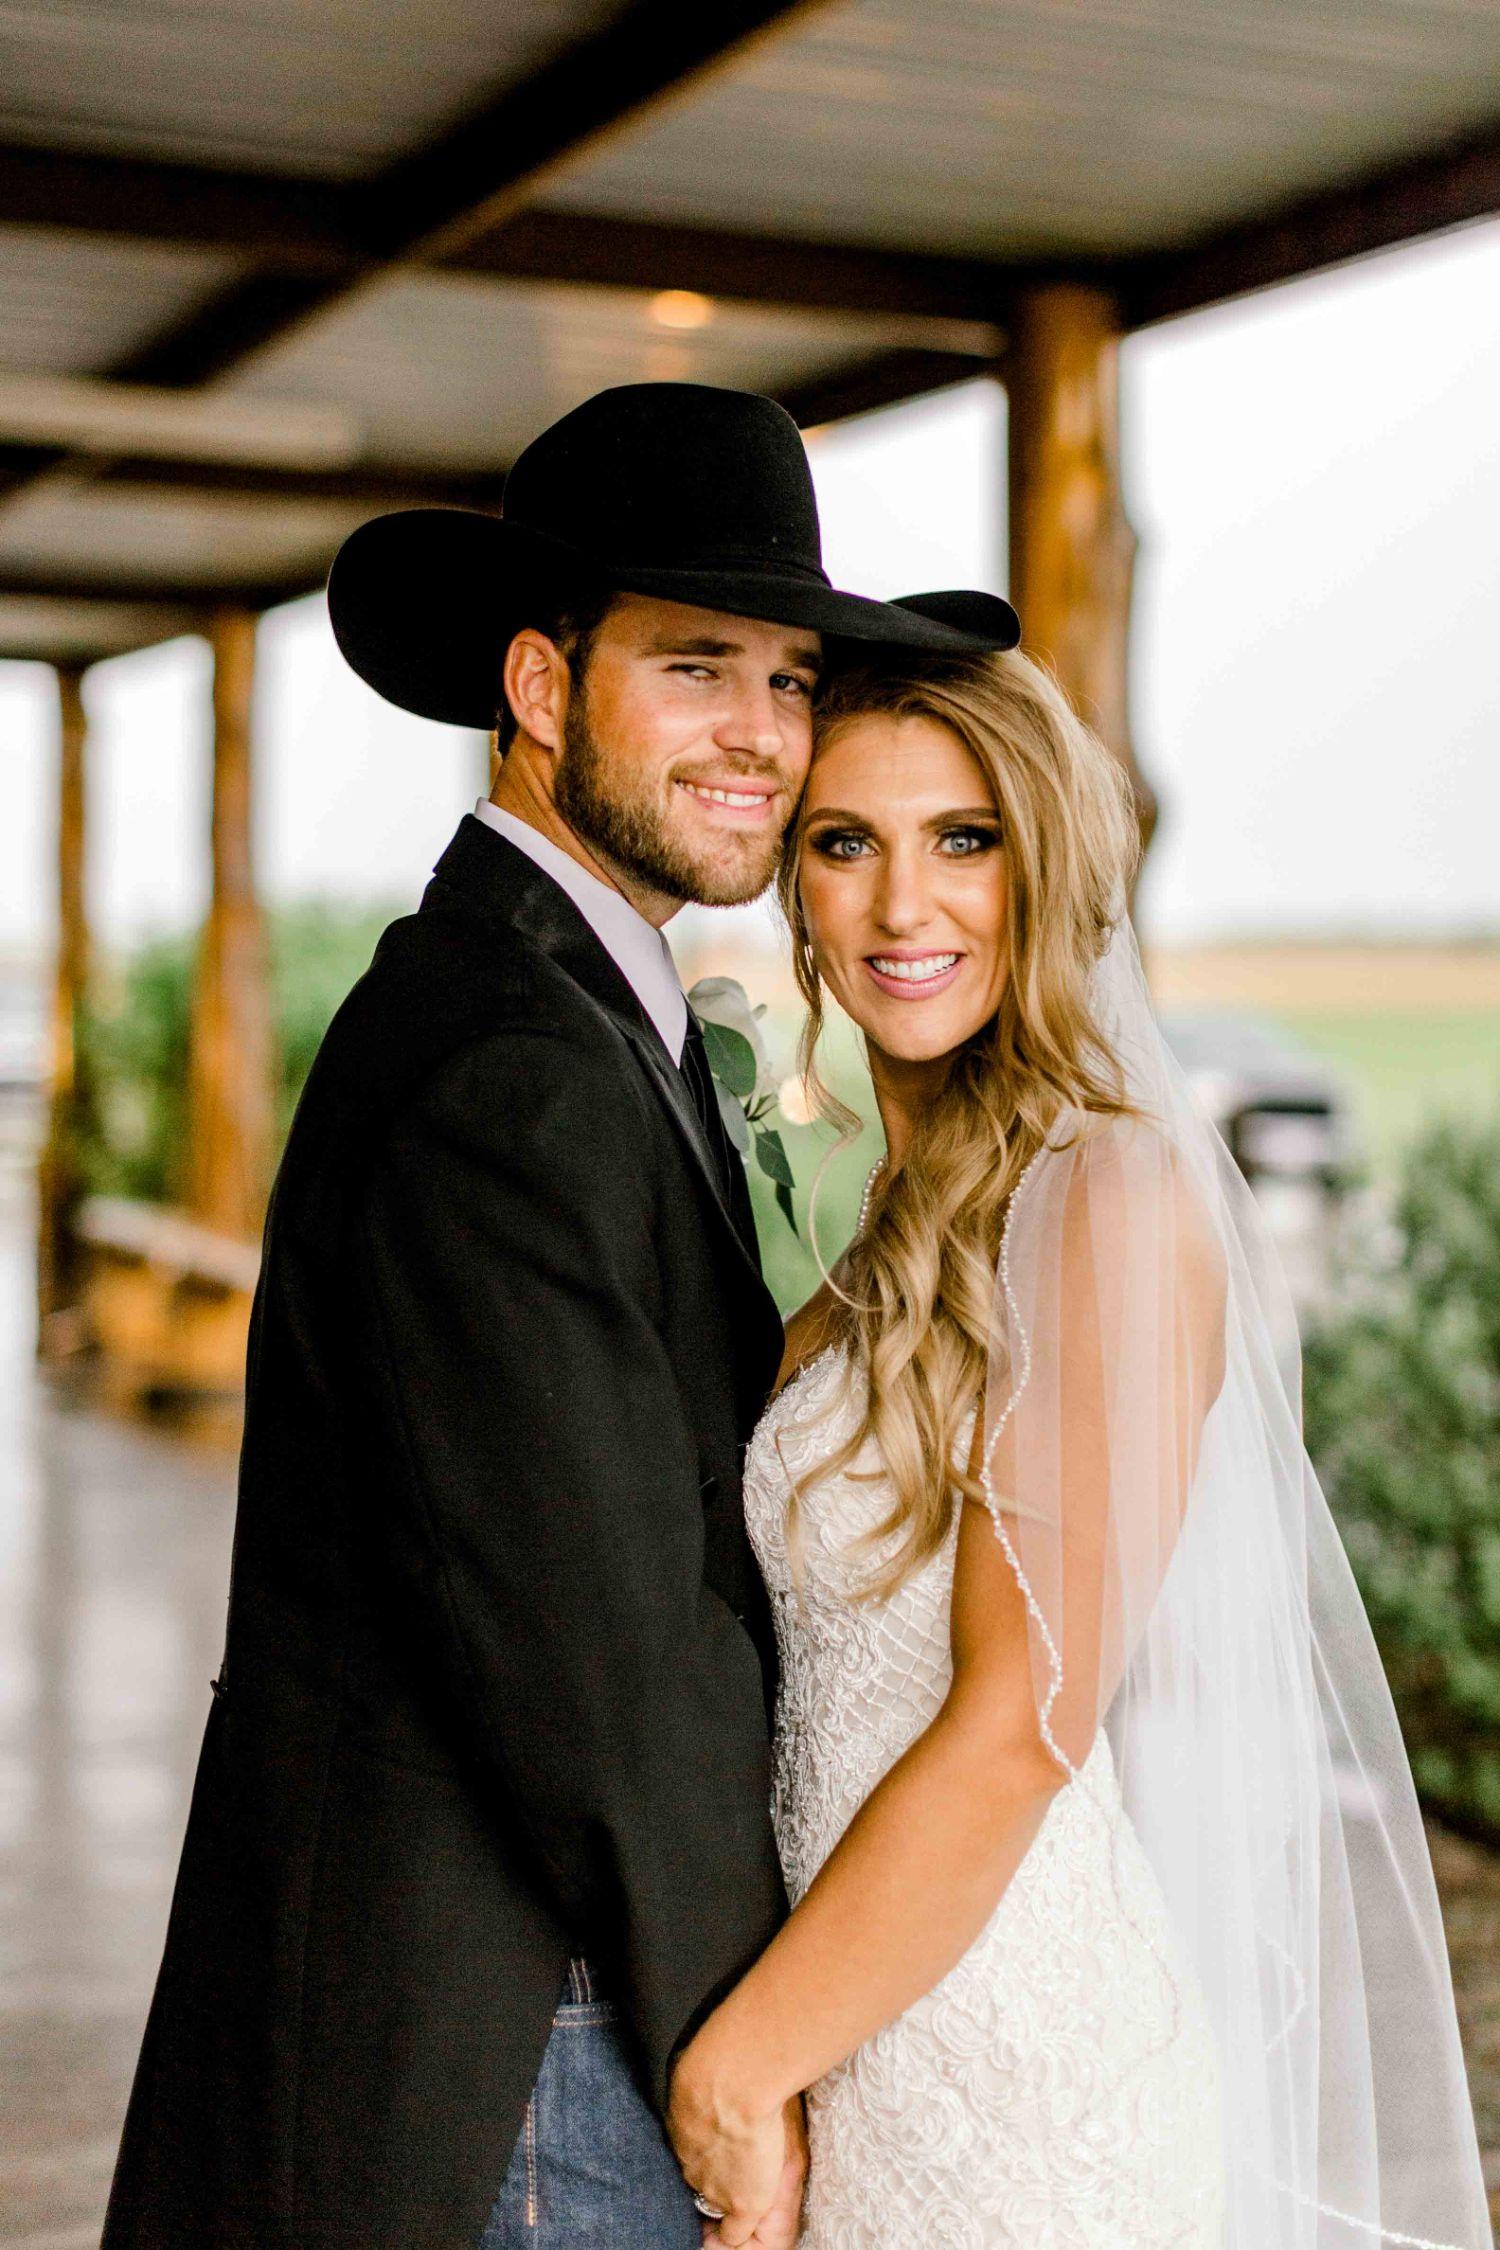 wichita-falls-wedding-katelyn-colten-vernon-texas-35.jpg